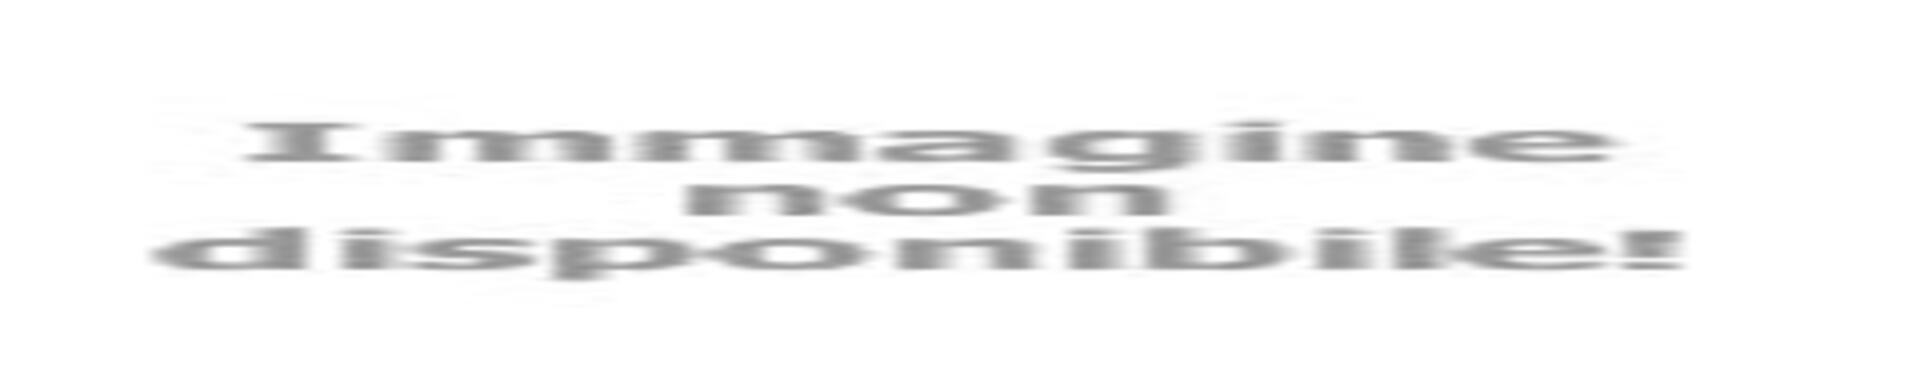 Offerta Ottobre Hotel Ischia con Ingresso alle Terme